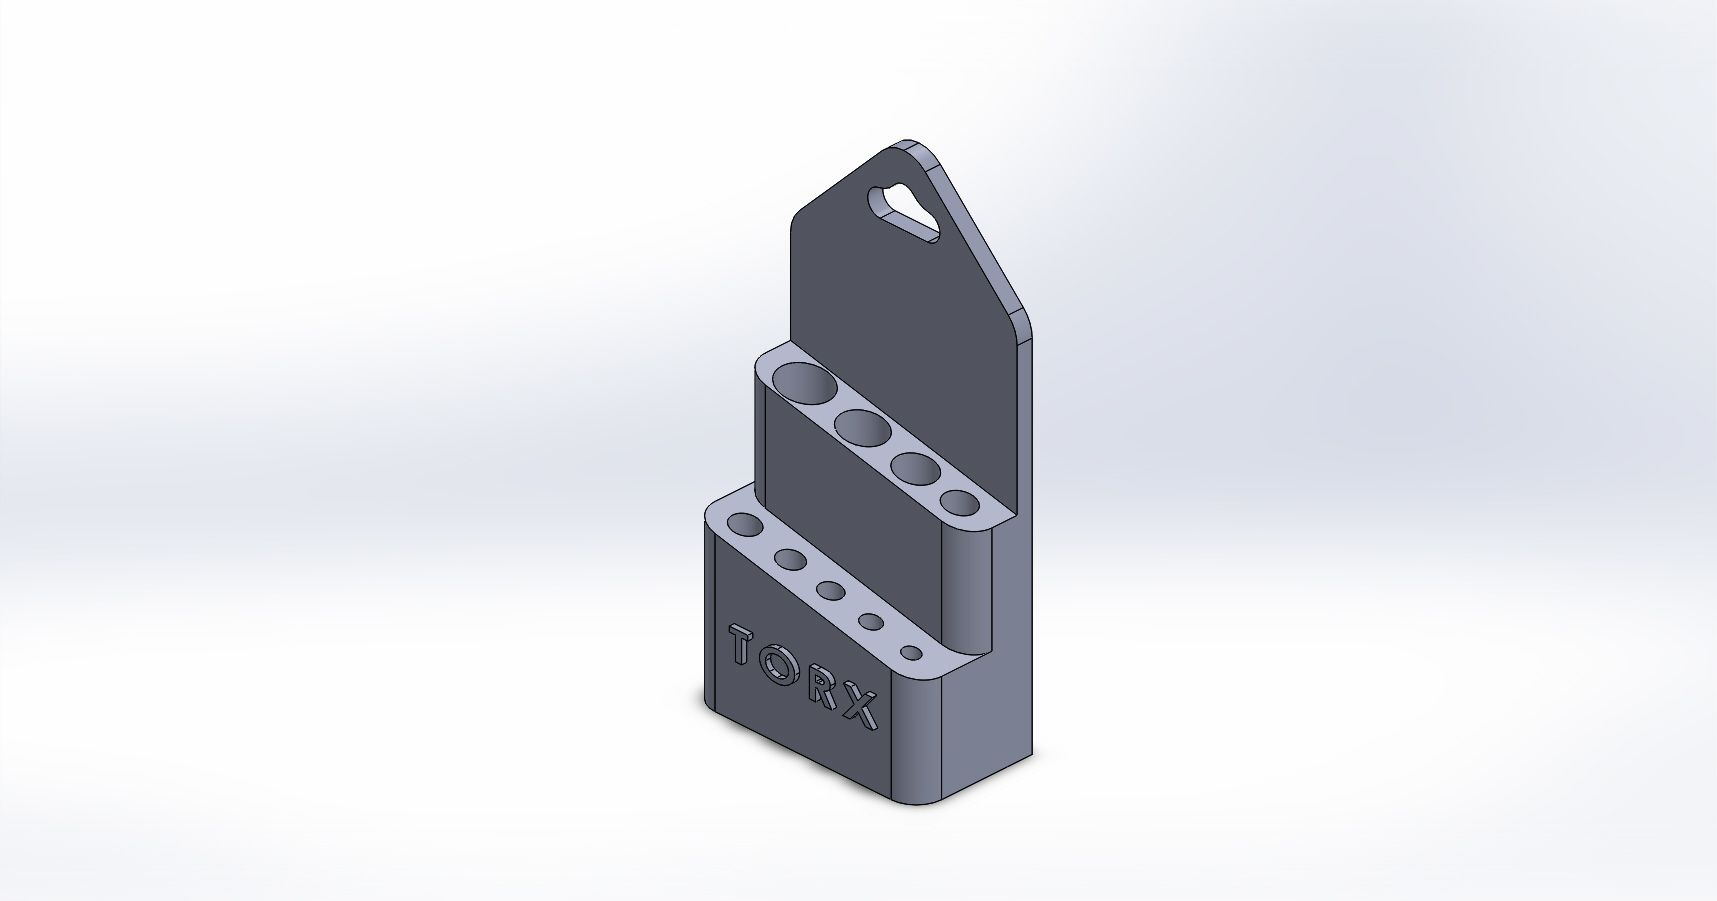 Torx.JPG Download free STL file BTR / TORX support • 3D print design, alaingiresini